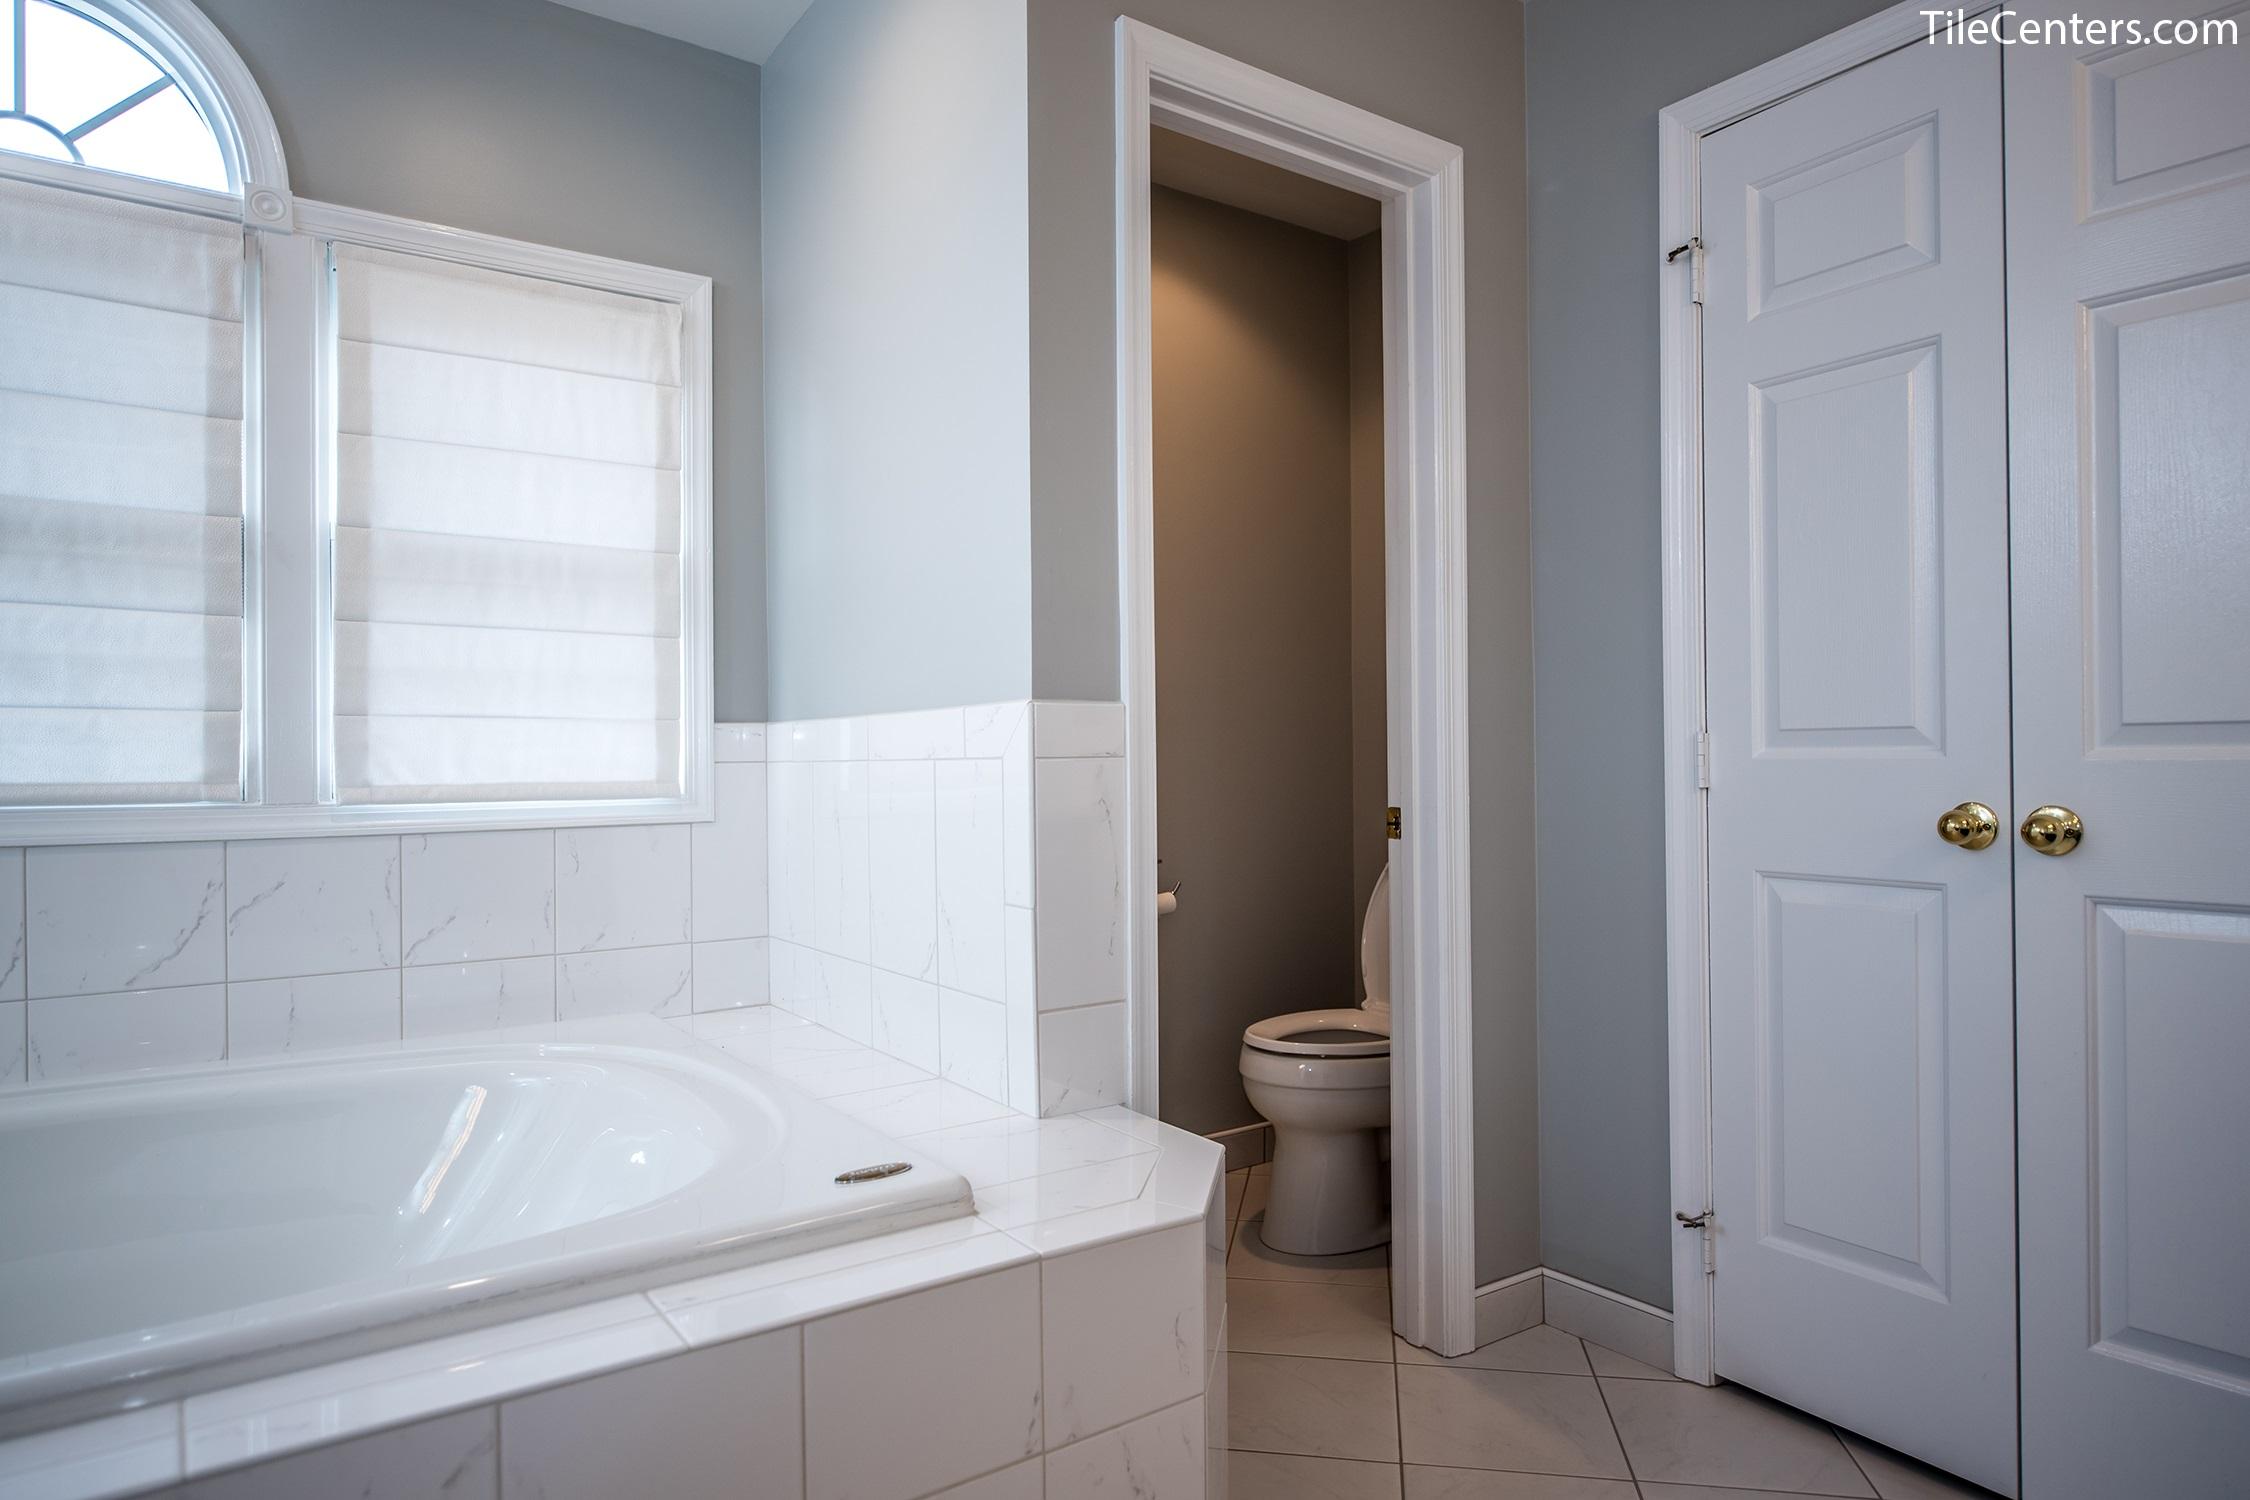 Bathroom - Little Tree Ct, Rockville, MD 20850: Tile Center ...